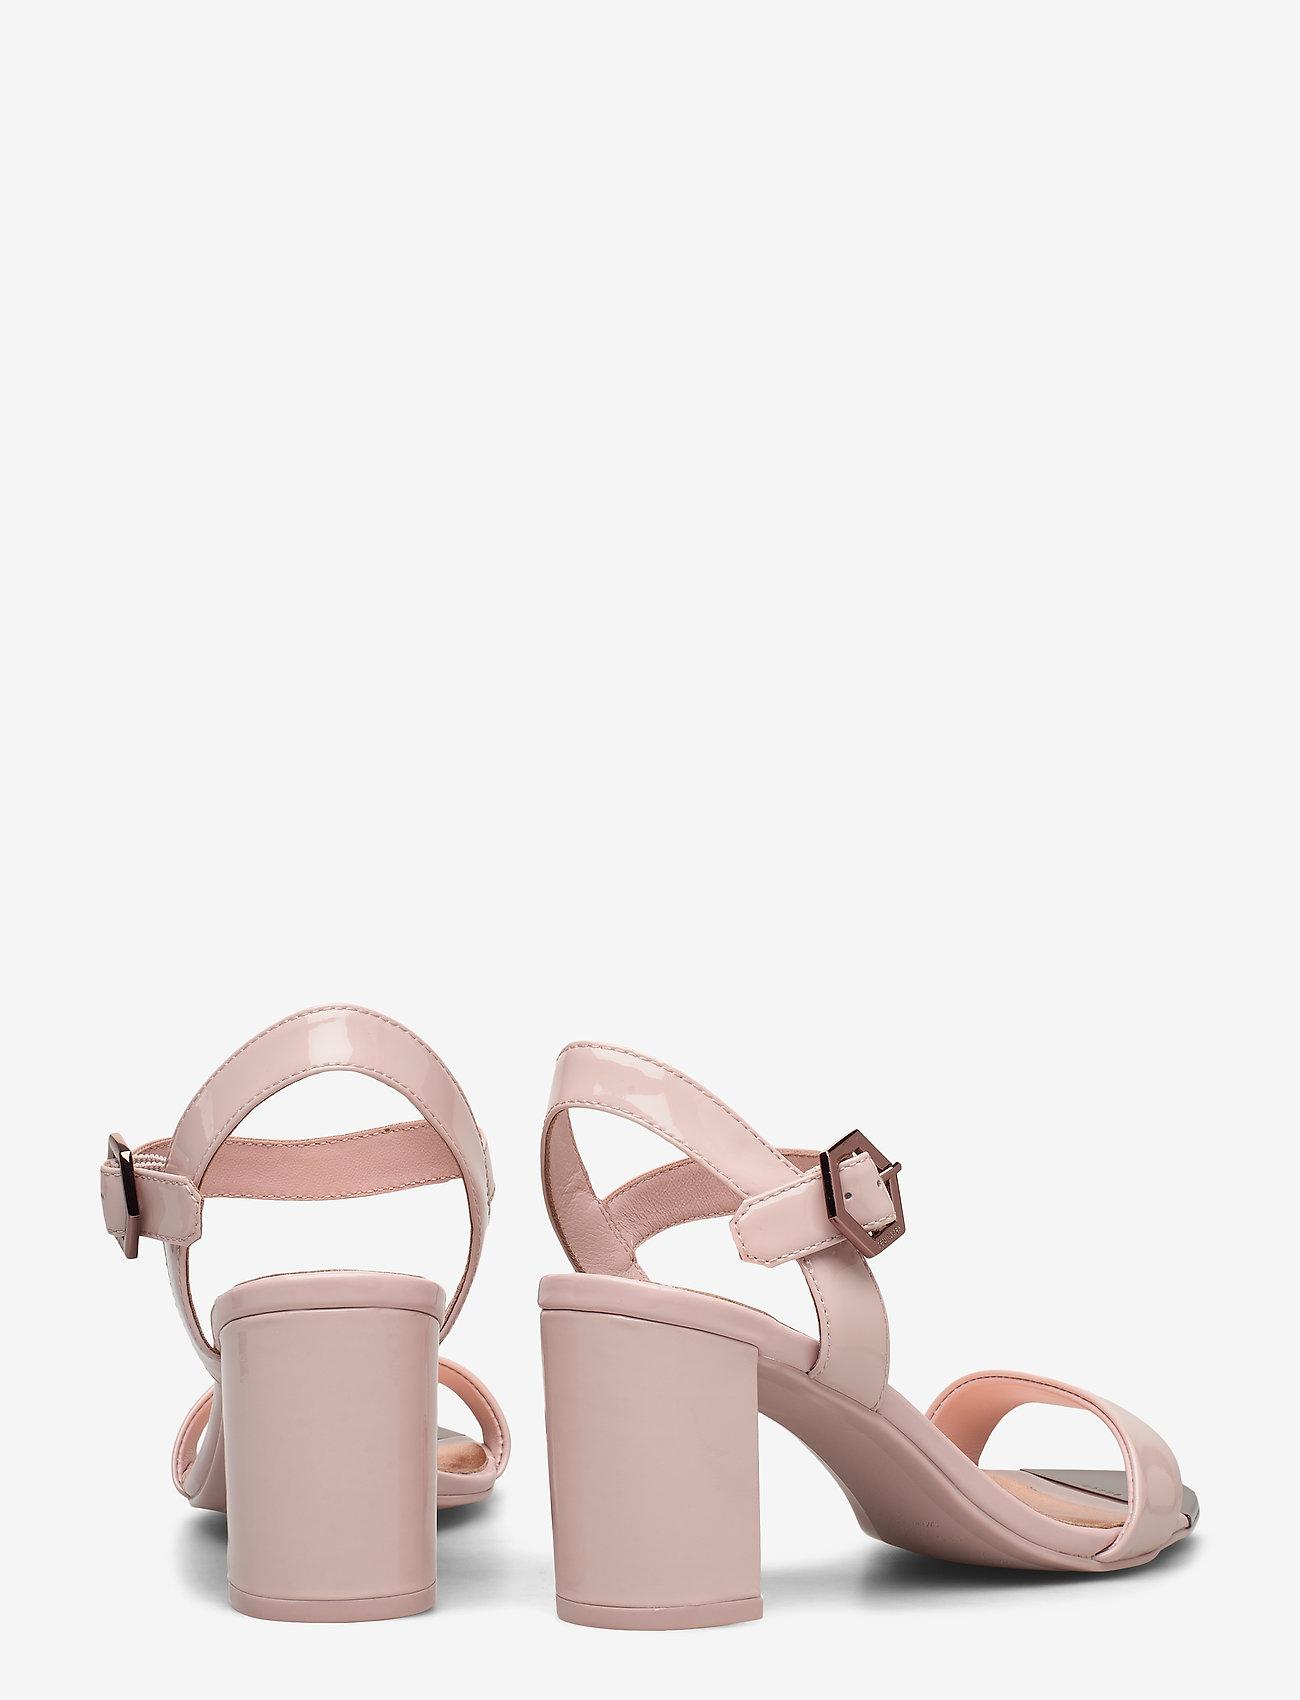 Hexiep (Nude-pink) - Ted Baker